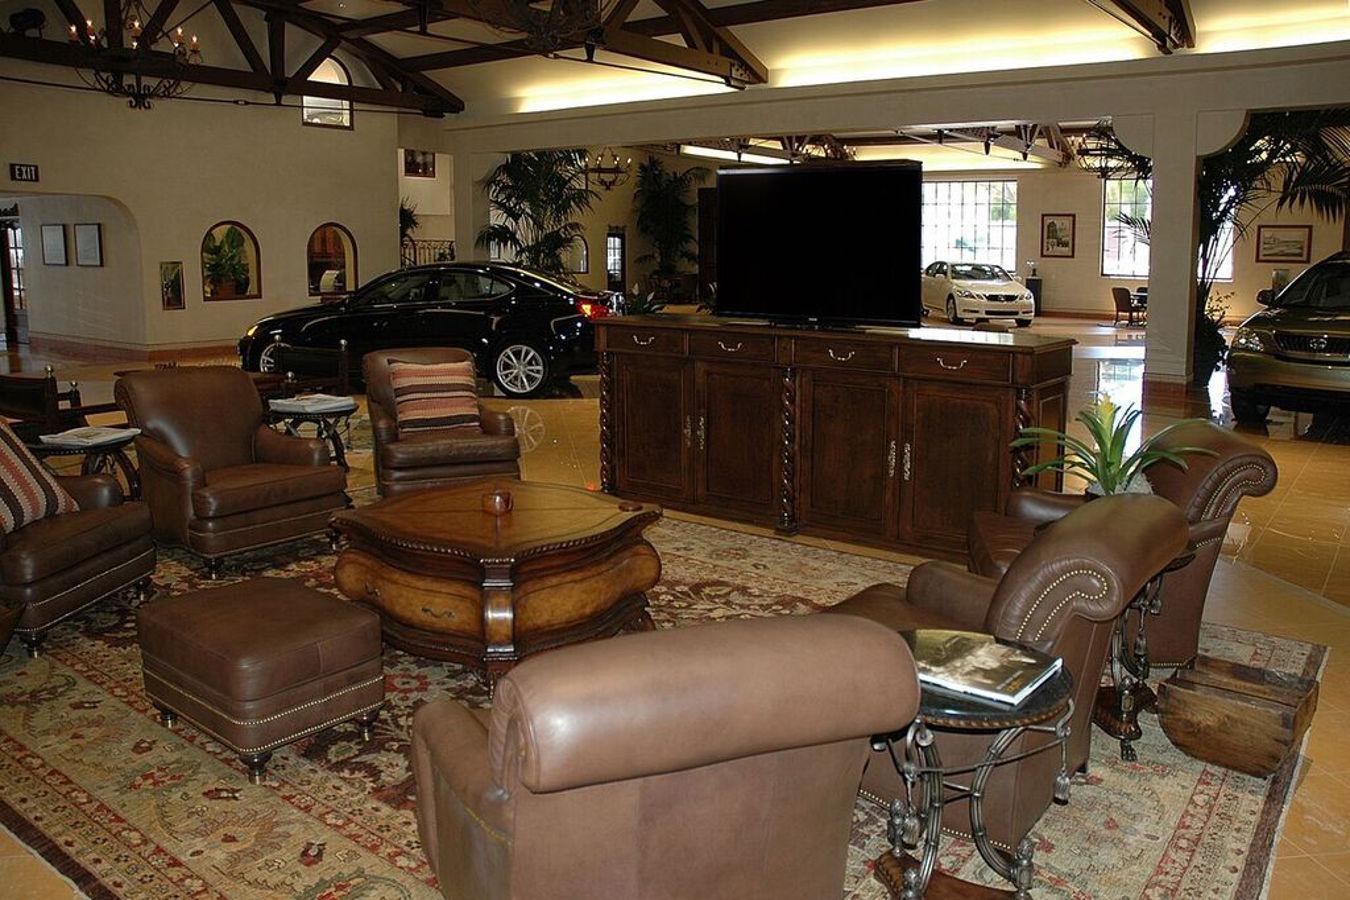 Lexus showroom with Cabinet Tronix TV lift furniture